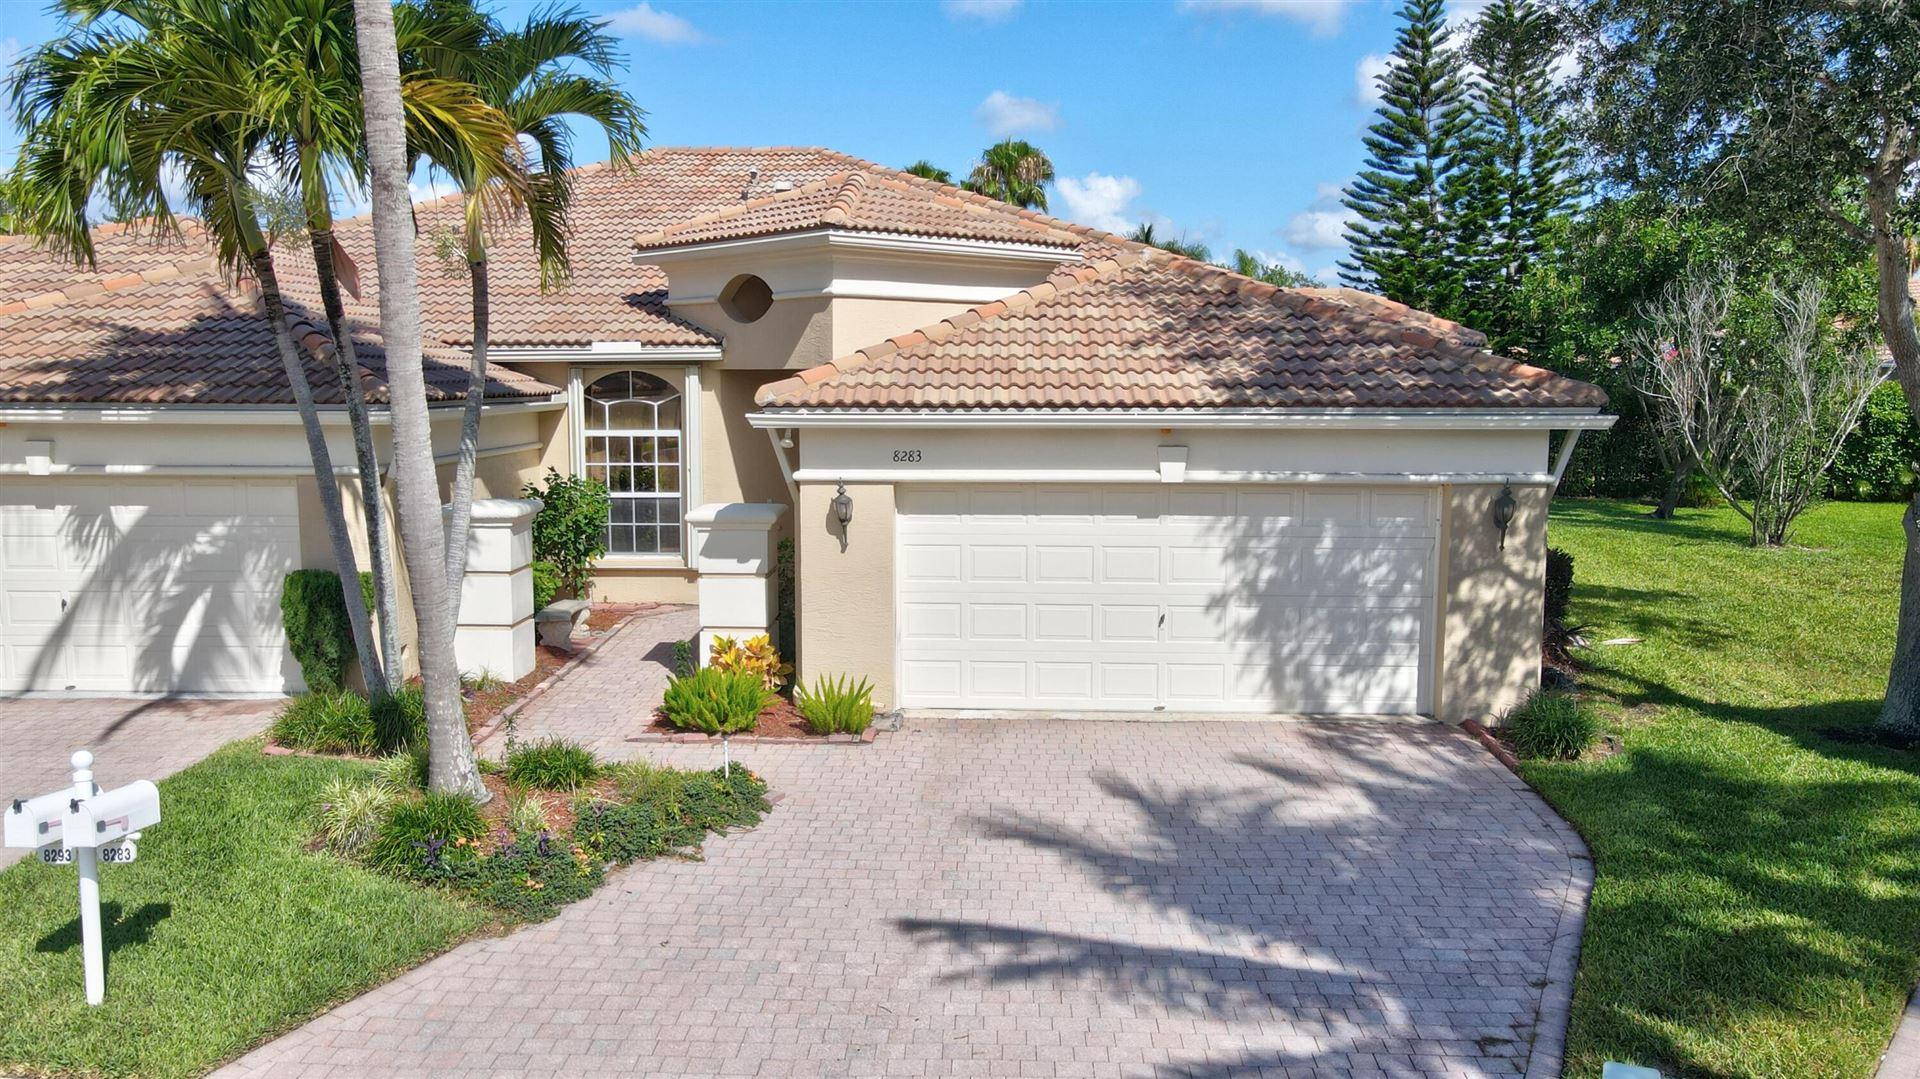 8283 Manjack Cay, West Palm Beach, FL 33411 - #: RX-10723919